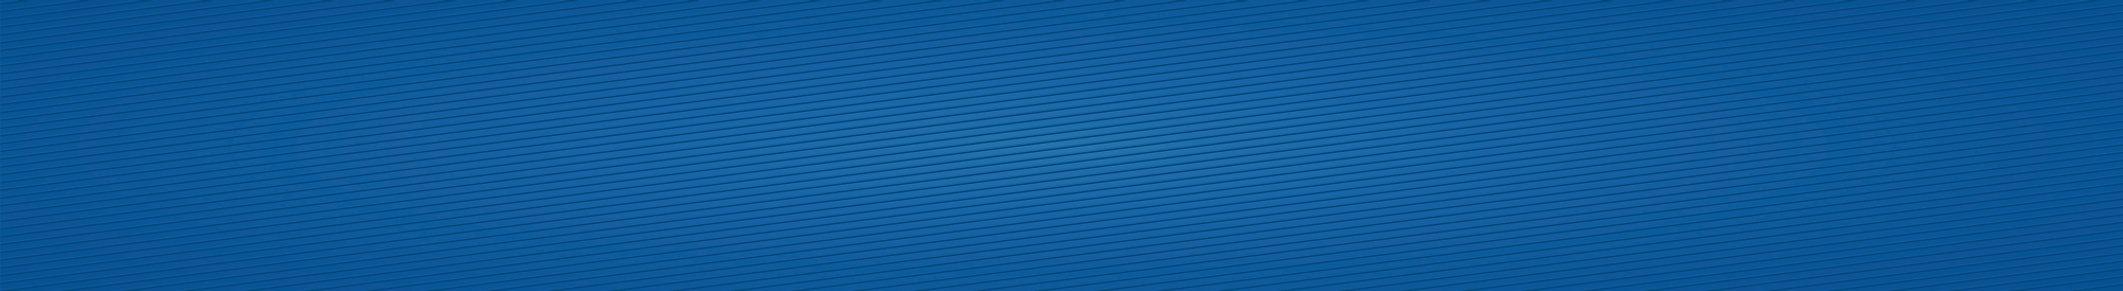 blue_strip copy.jpg